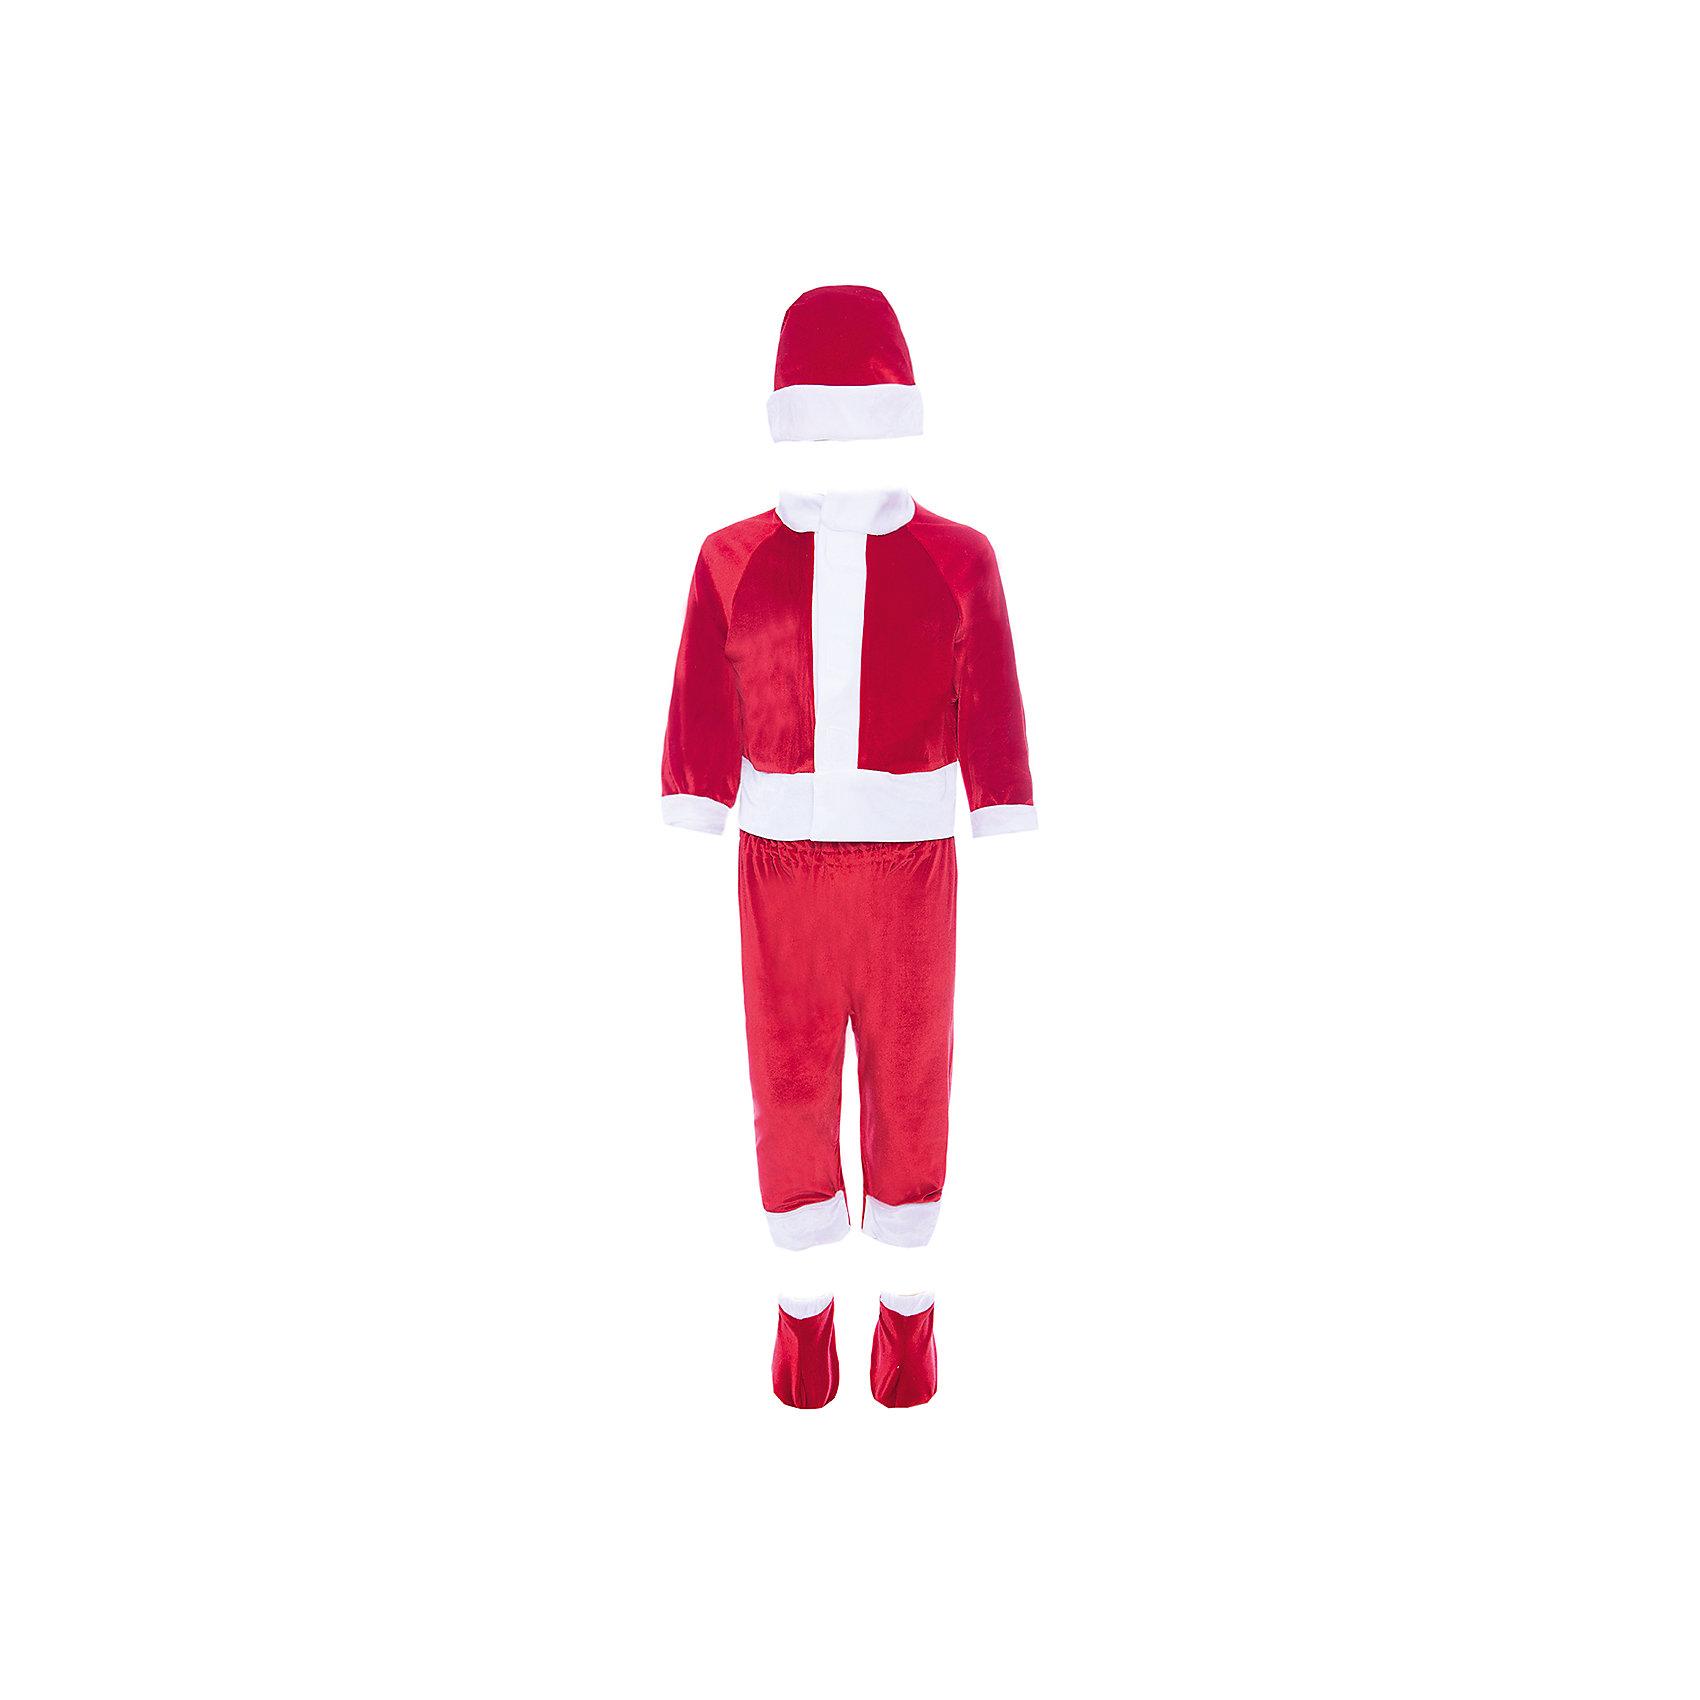 Вестифика Карнавальный костюм Санта Клаус, Вестифика эбер клаус обувь где